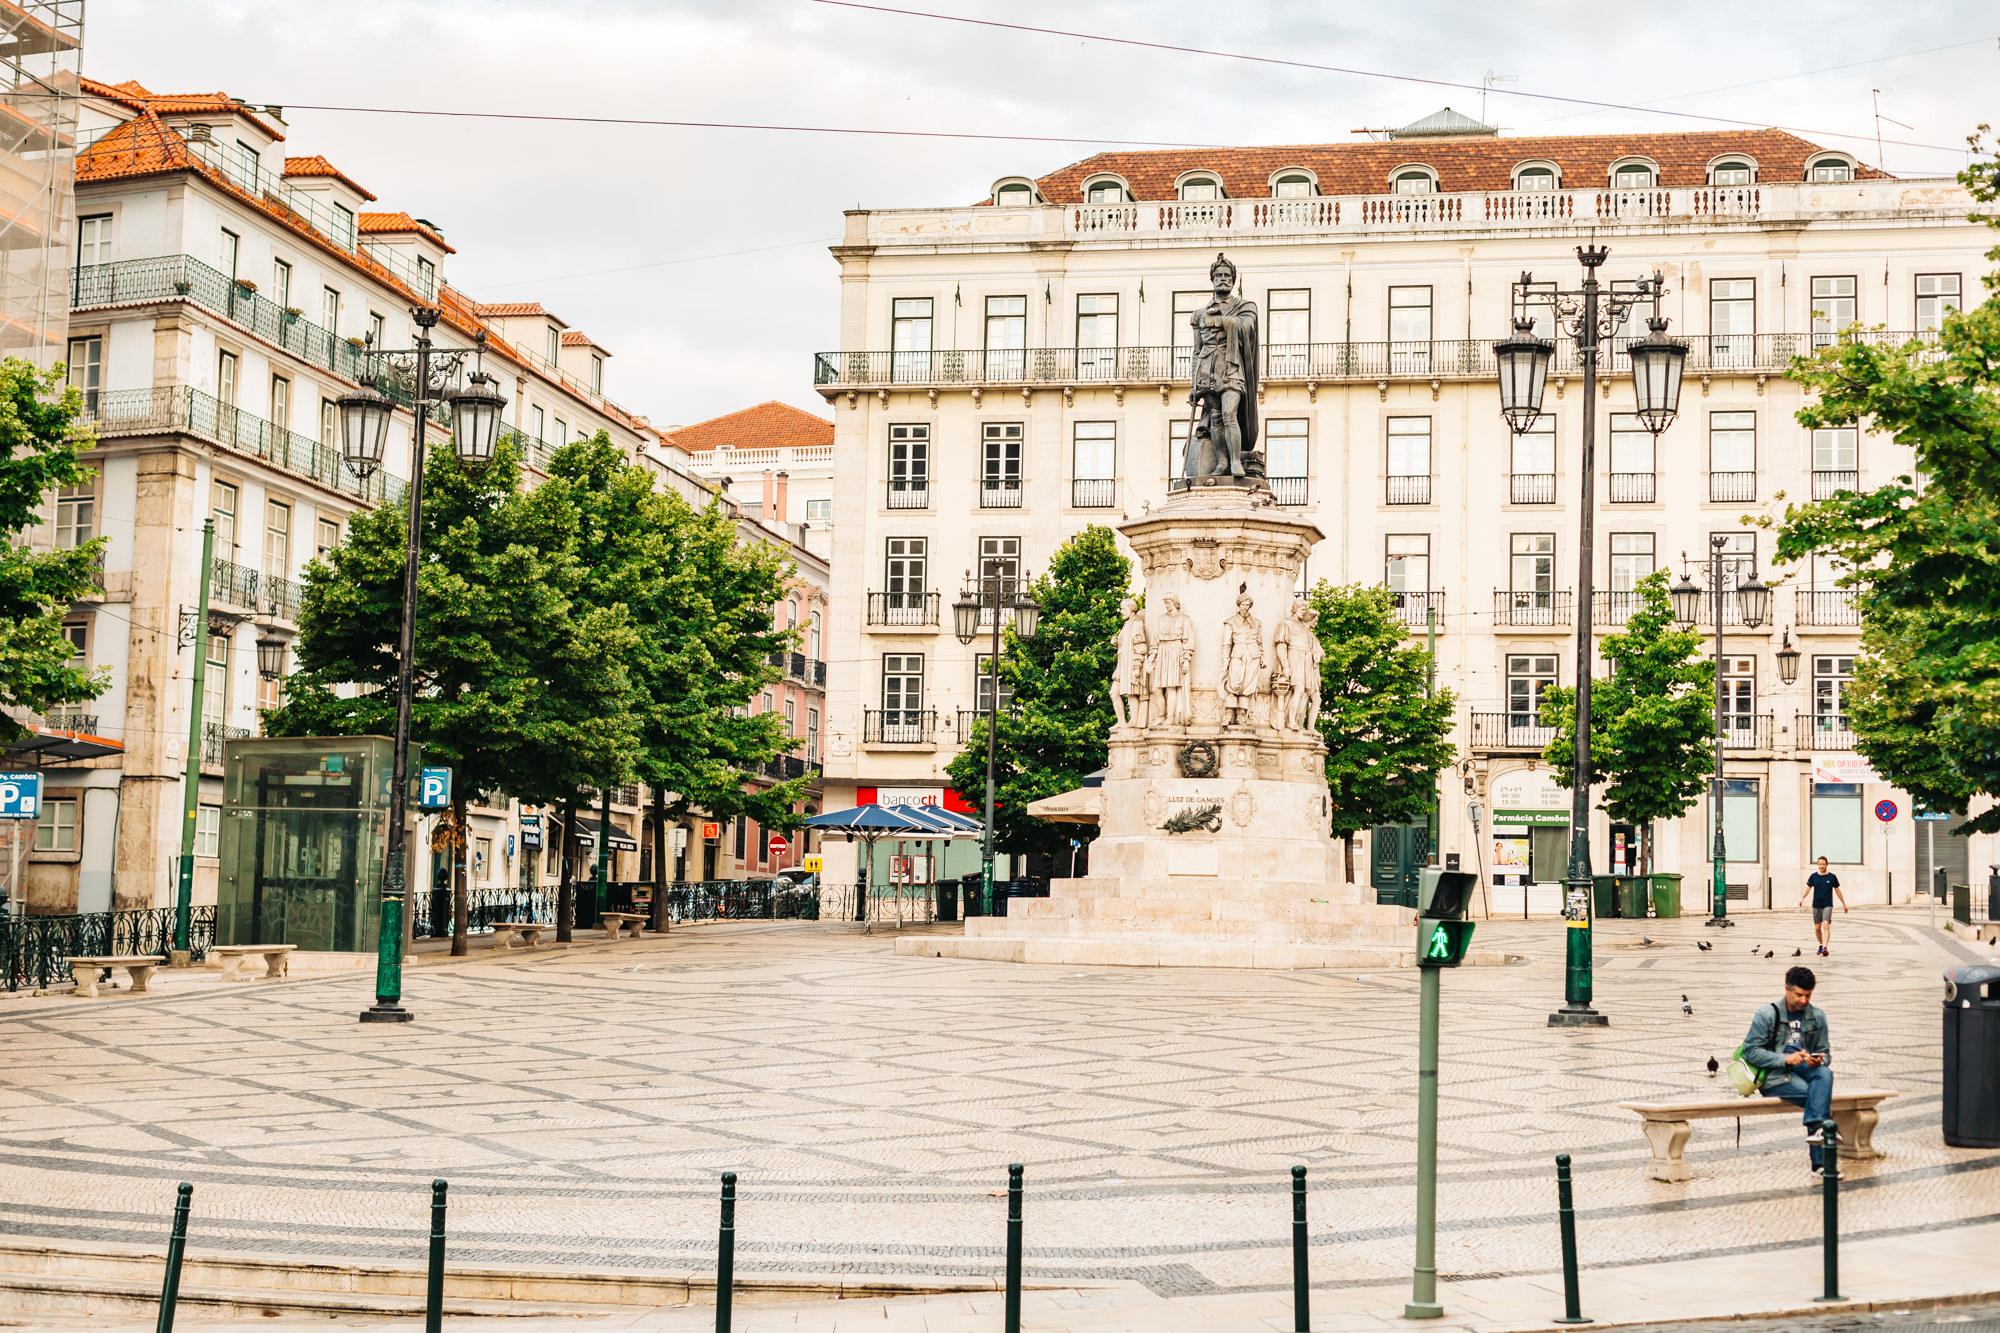 Praça Luís de Camões - popular square and meeting spot in Lisbon